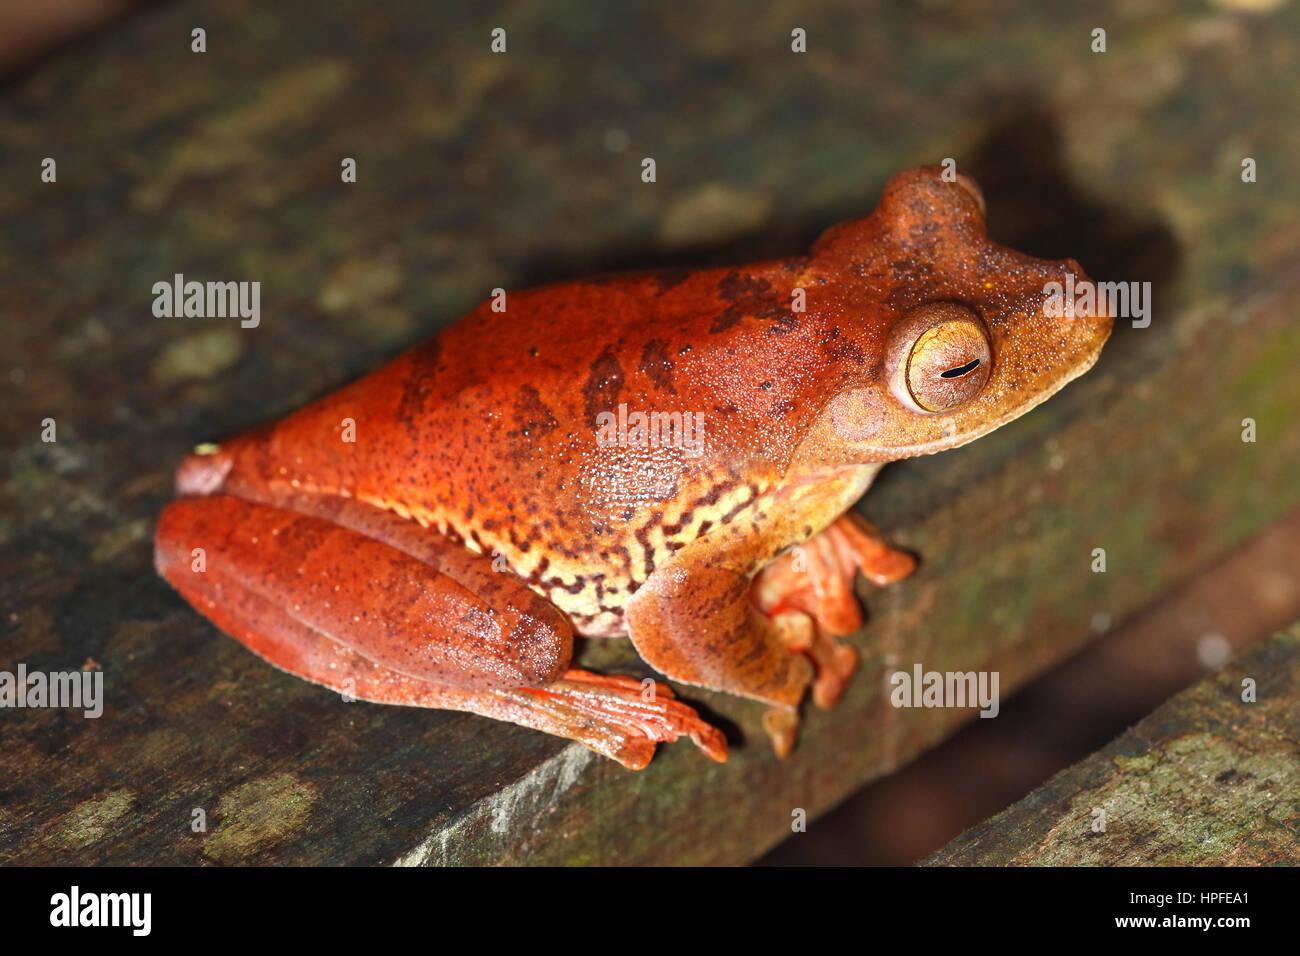 Harlequin tree frog (Rhacophorus Pardalis), Kubah National Park, Sarawak, Borneo, Malaysia - Stock Image